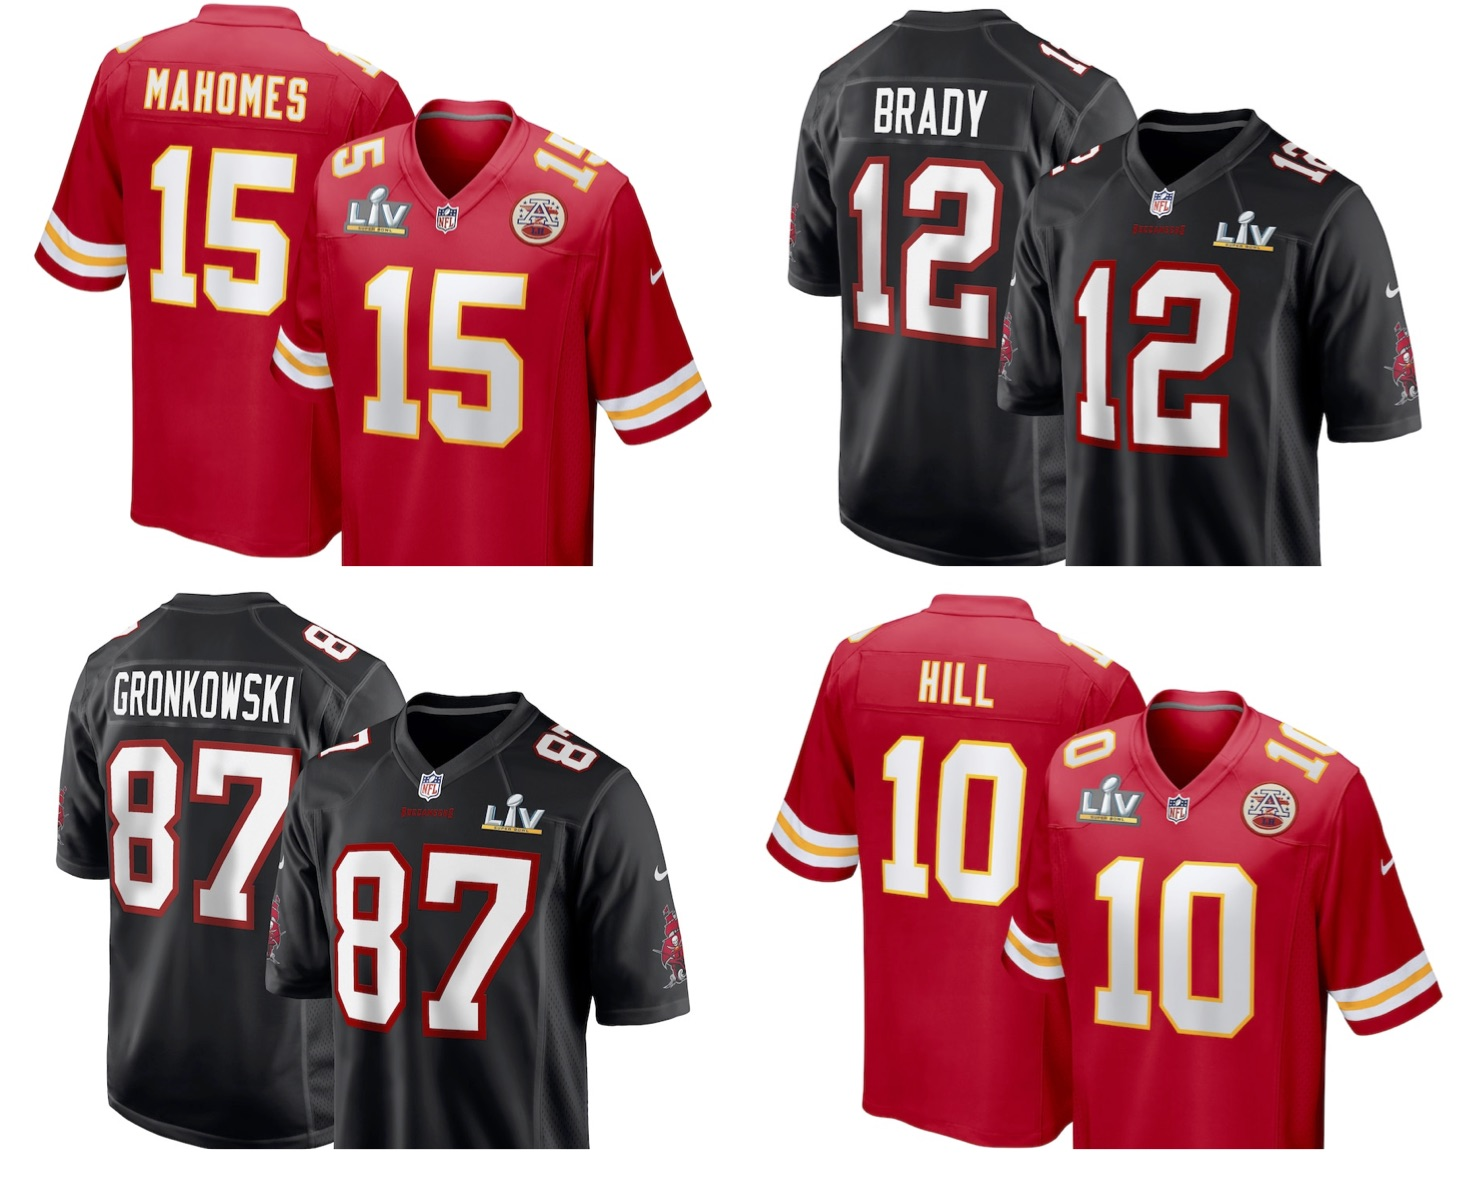 NFL: Where to buy Super Bowl LV jerseys